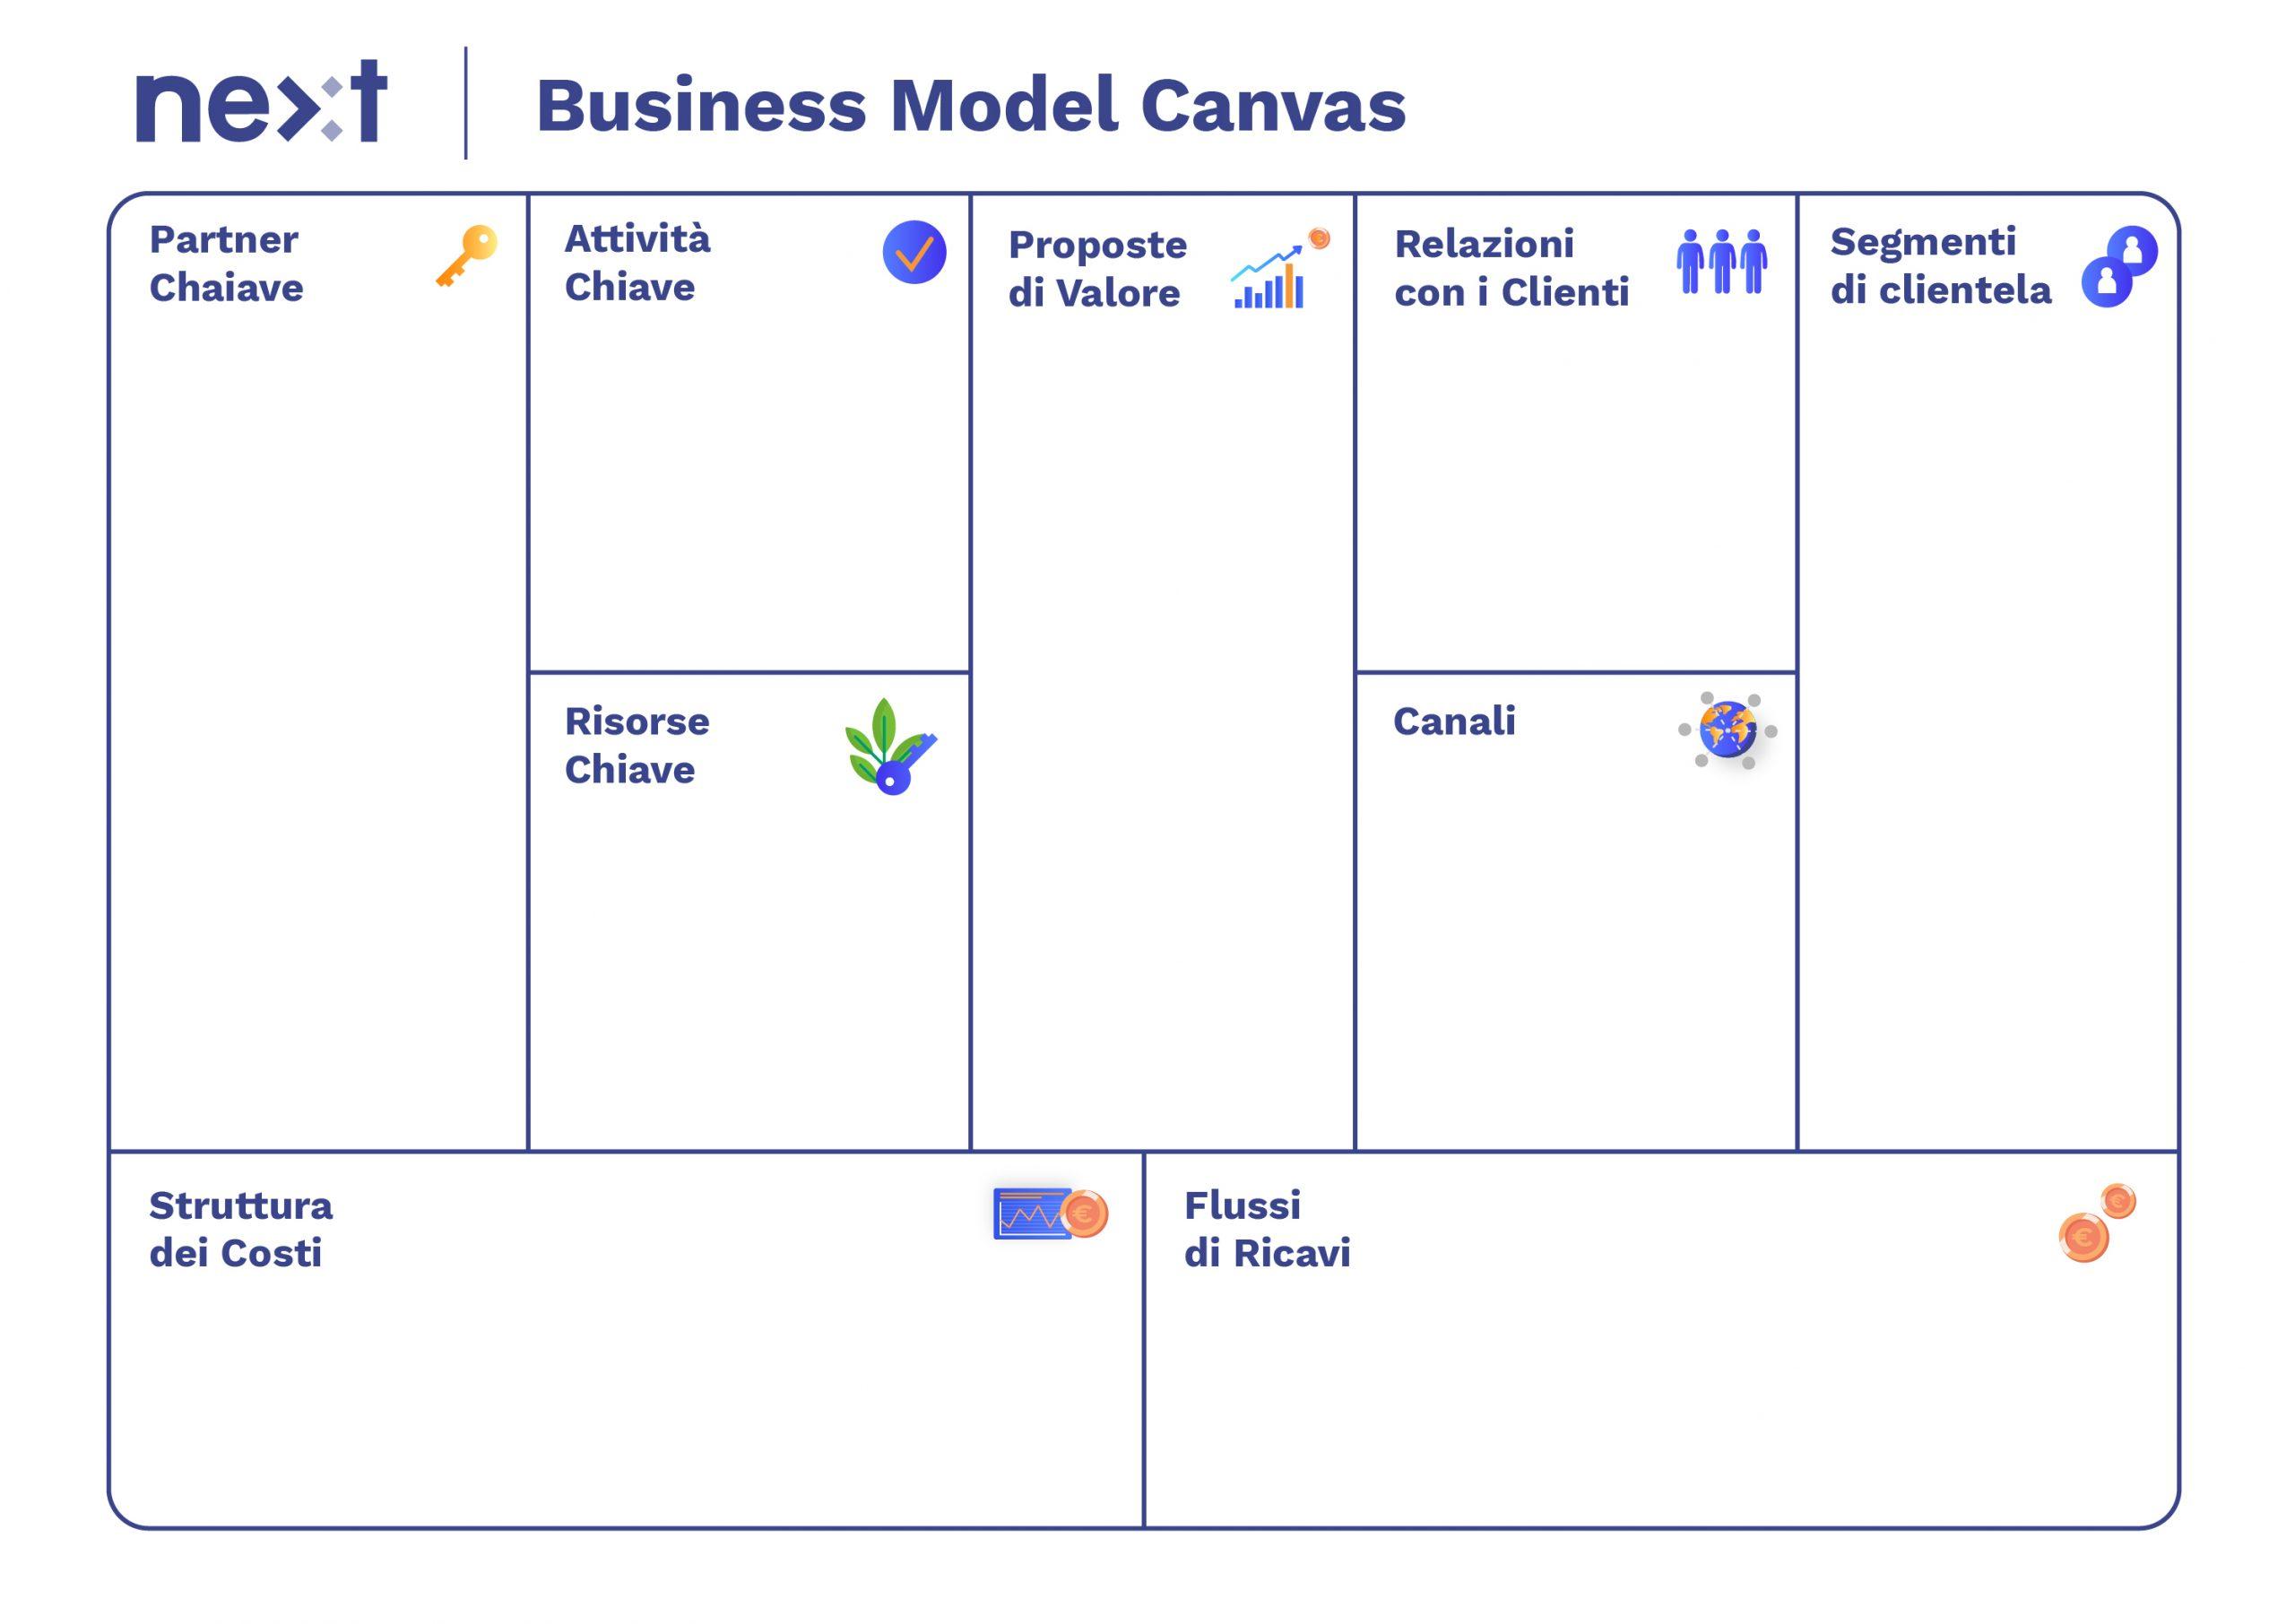 business model canvas nextadv